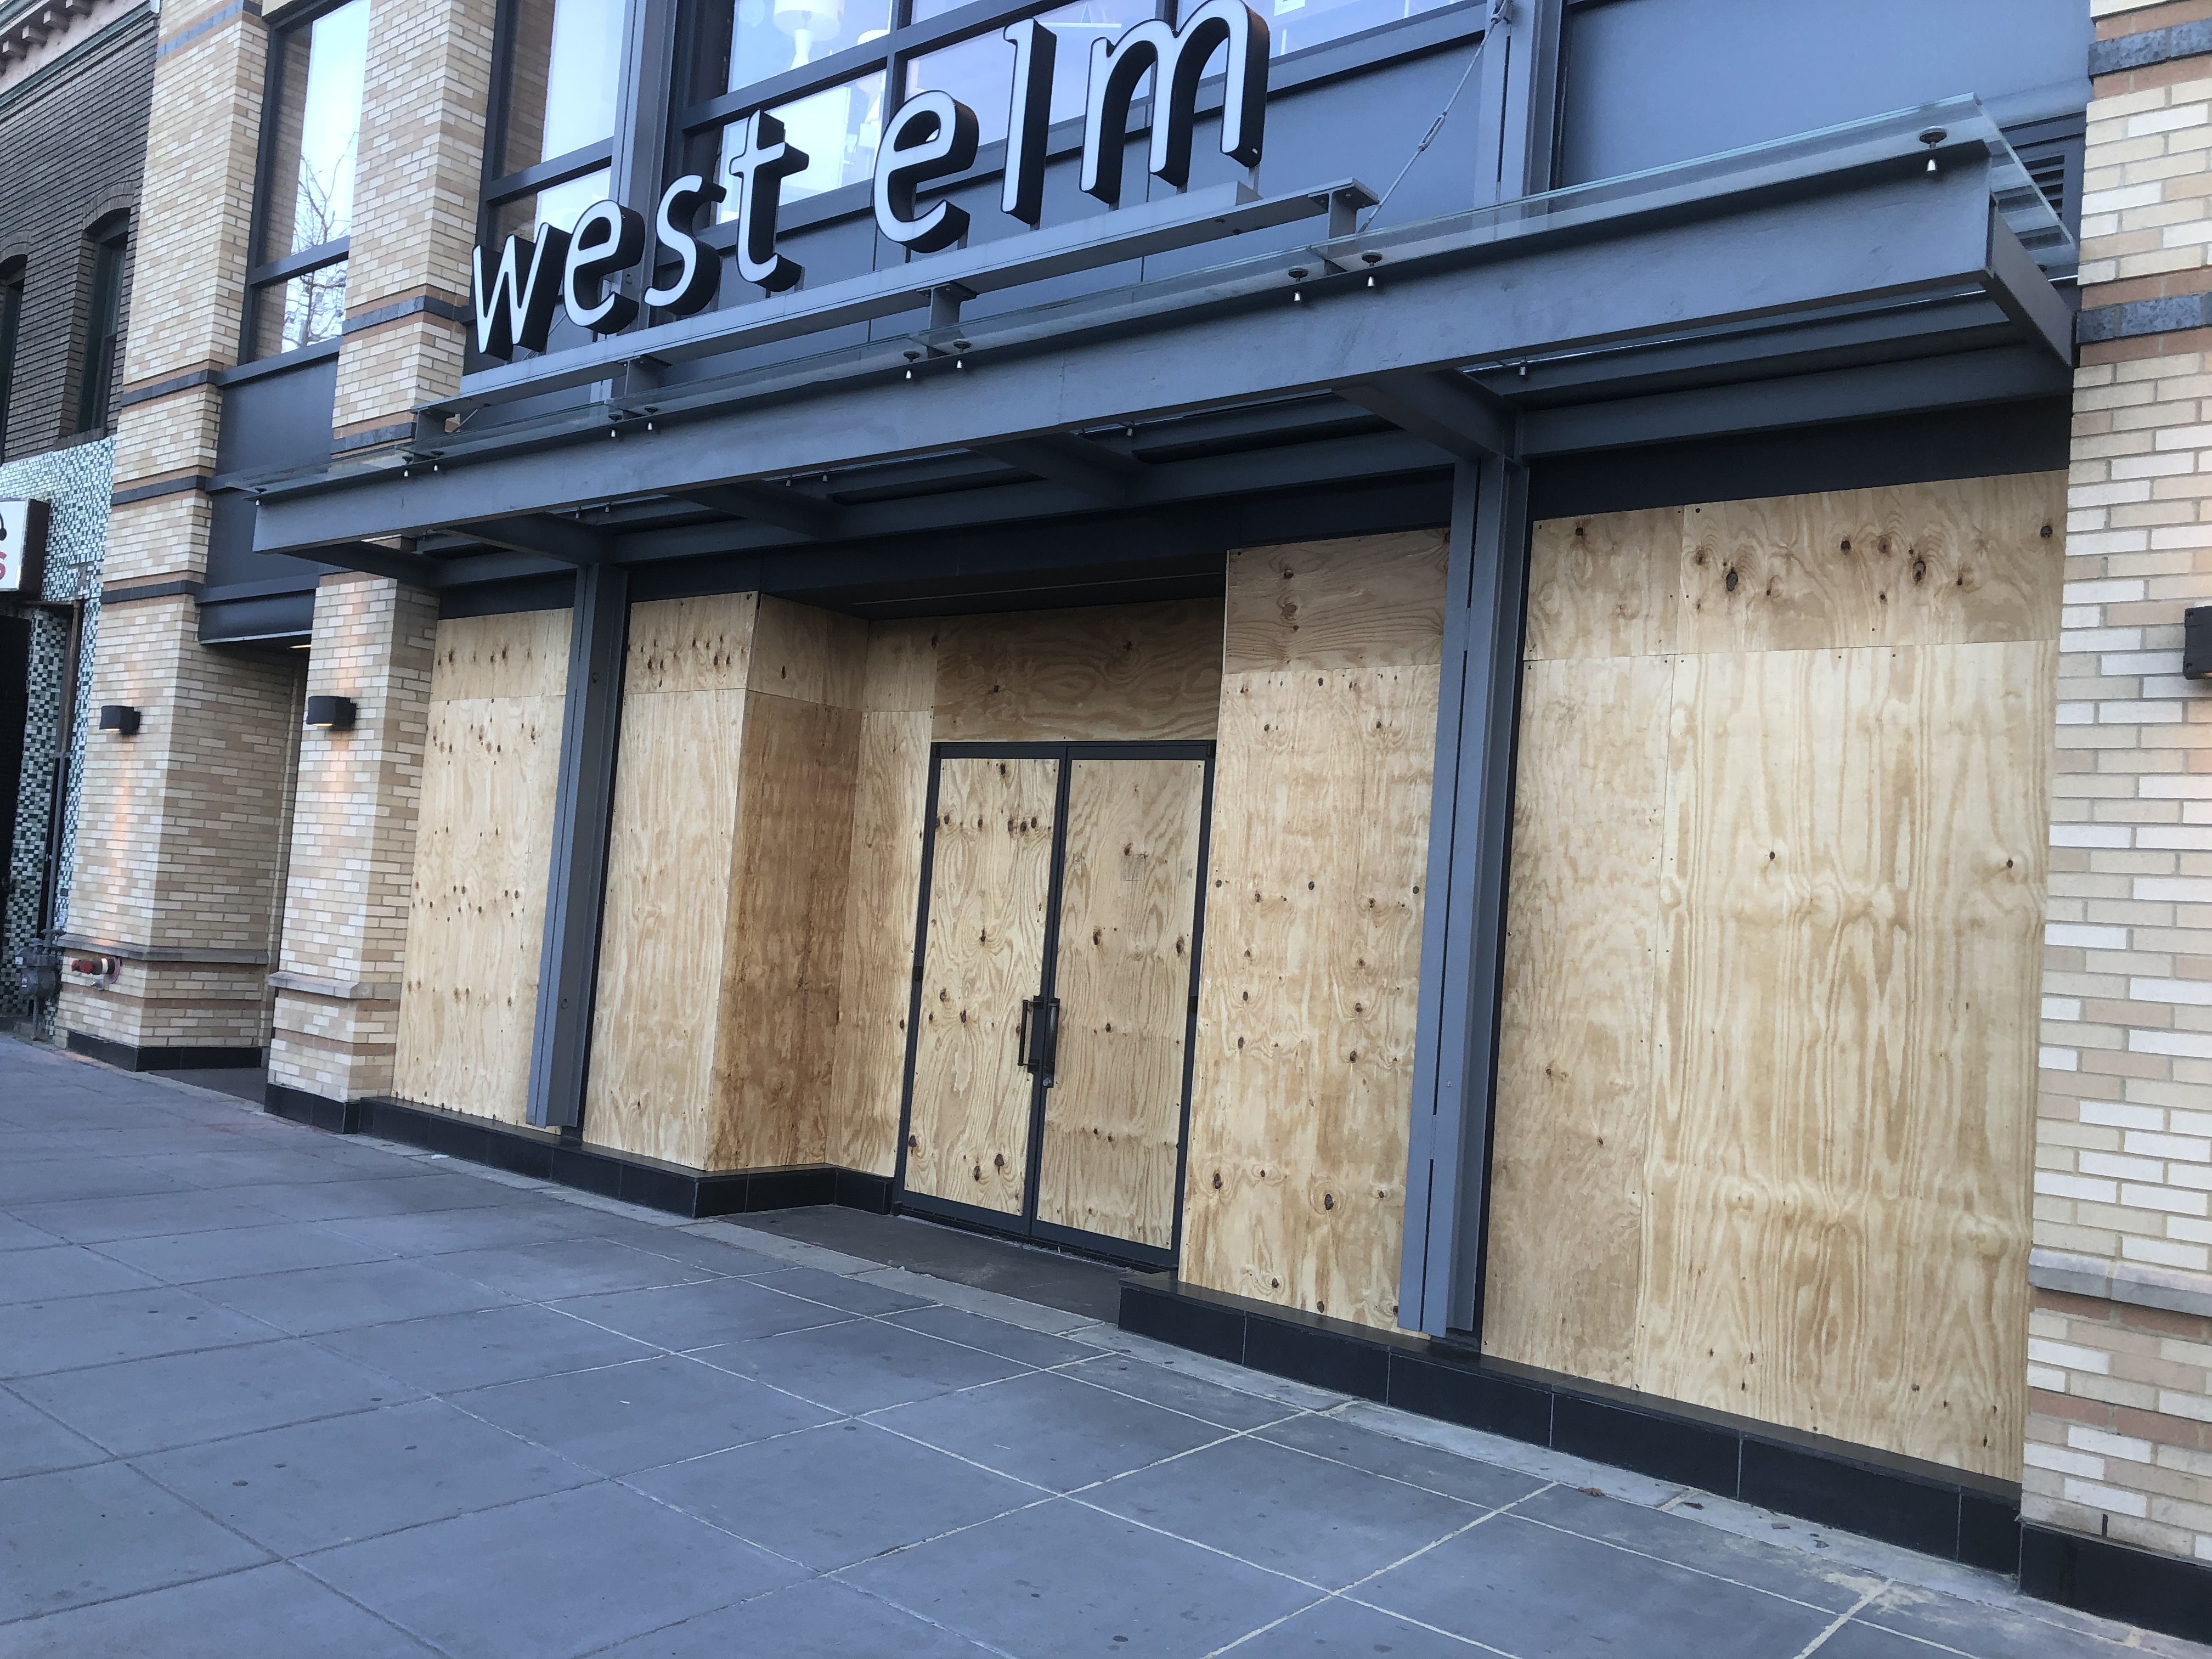 D C Stores Board Up Windows During Coronavirus Pandemic The Washington Post